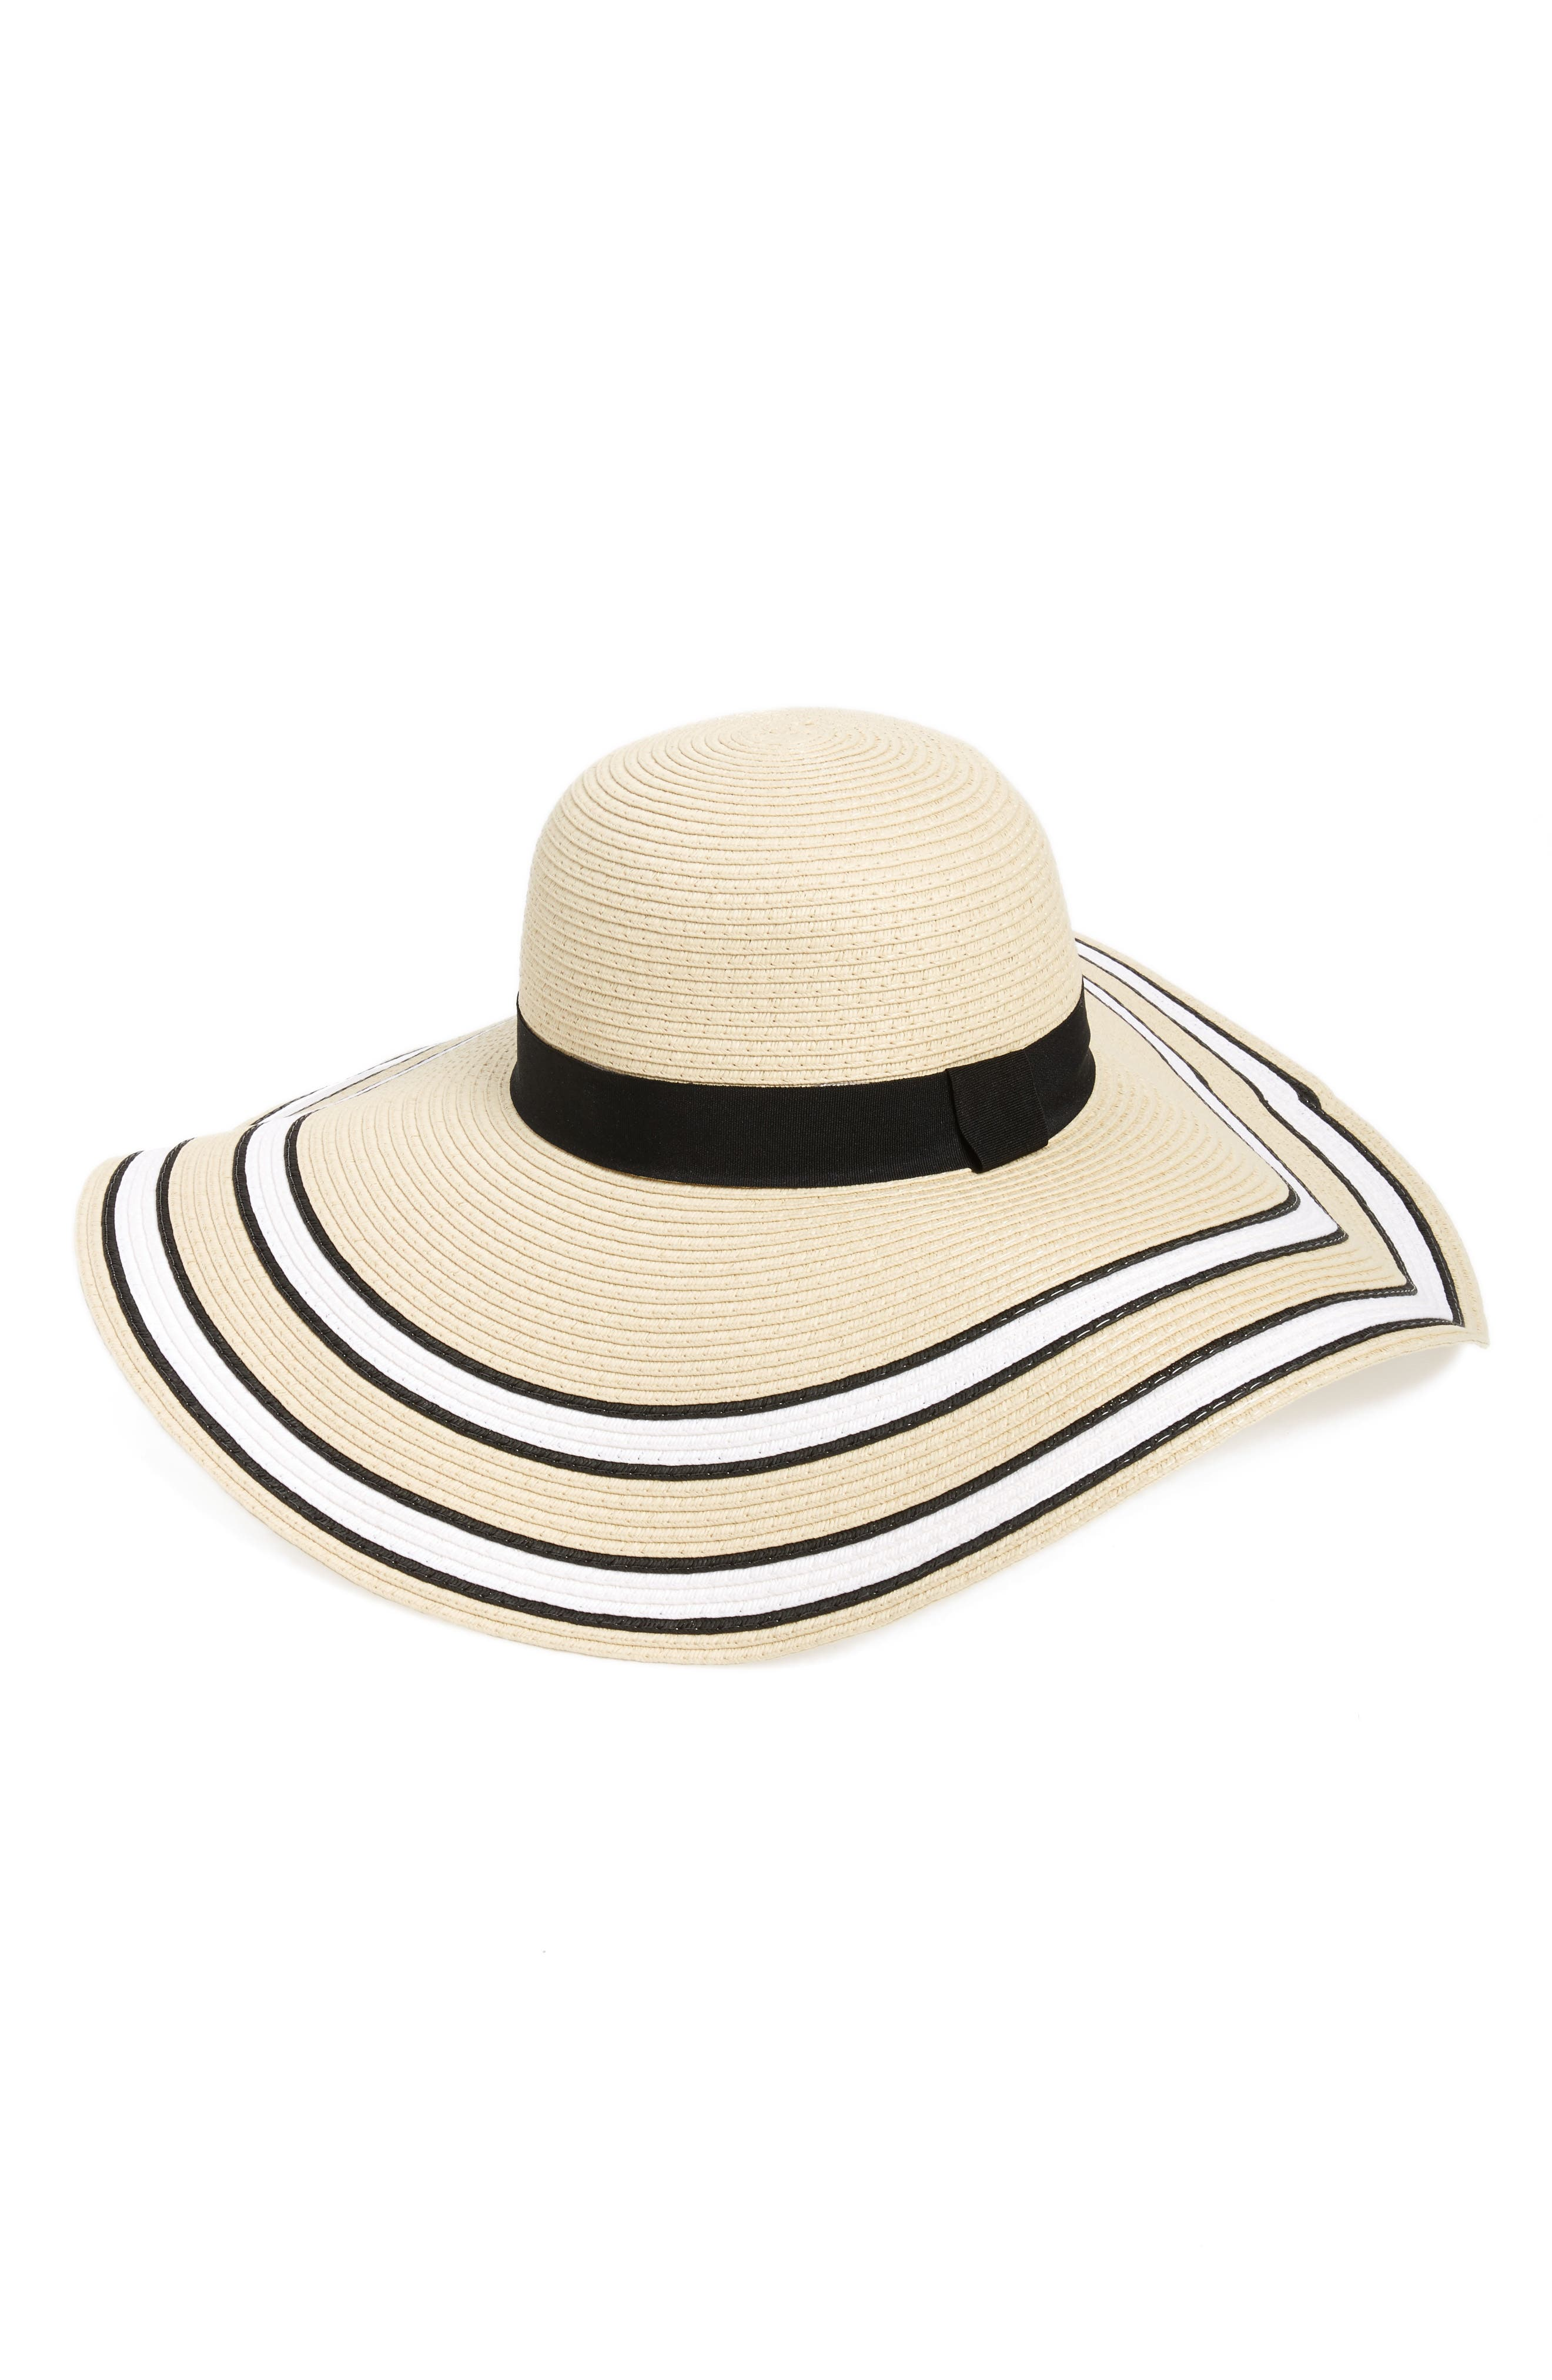 Alternate Image 1 Selected - BP. Stripe Floppy Brim Straw Hat